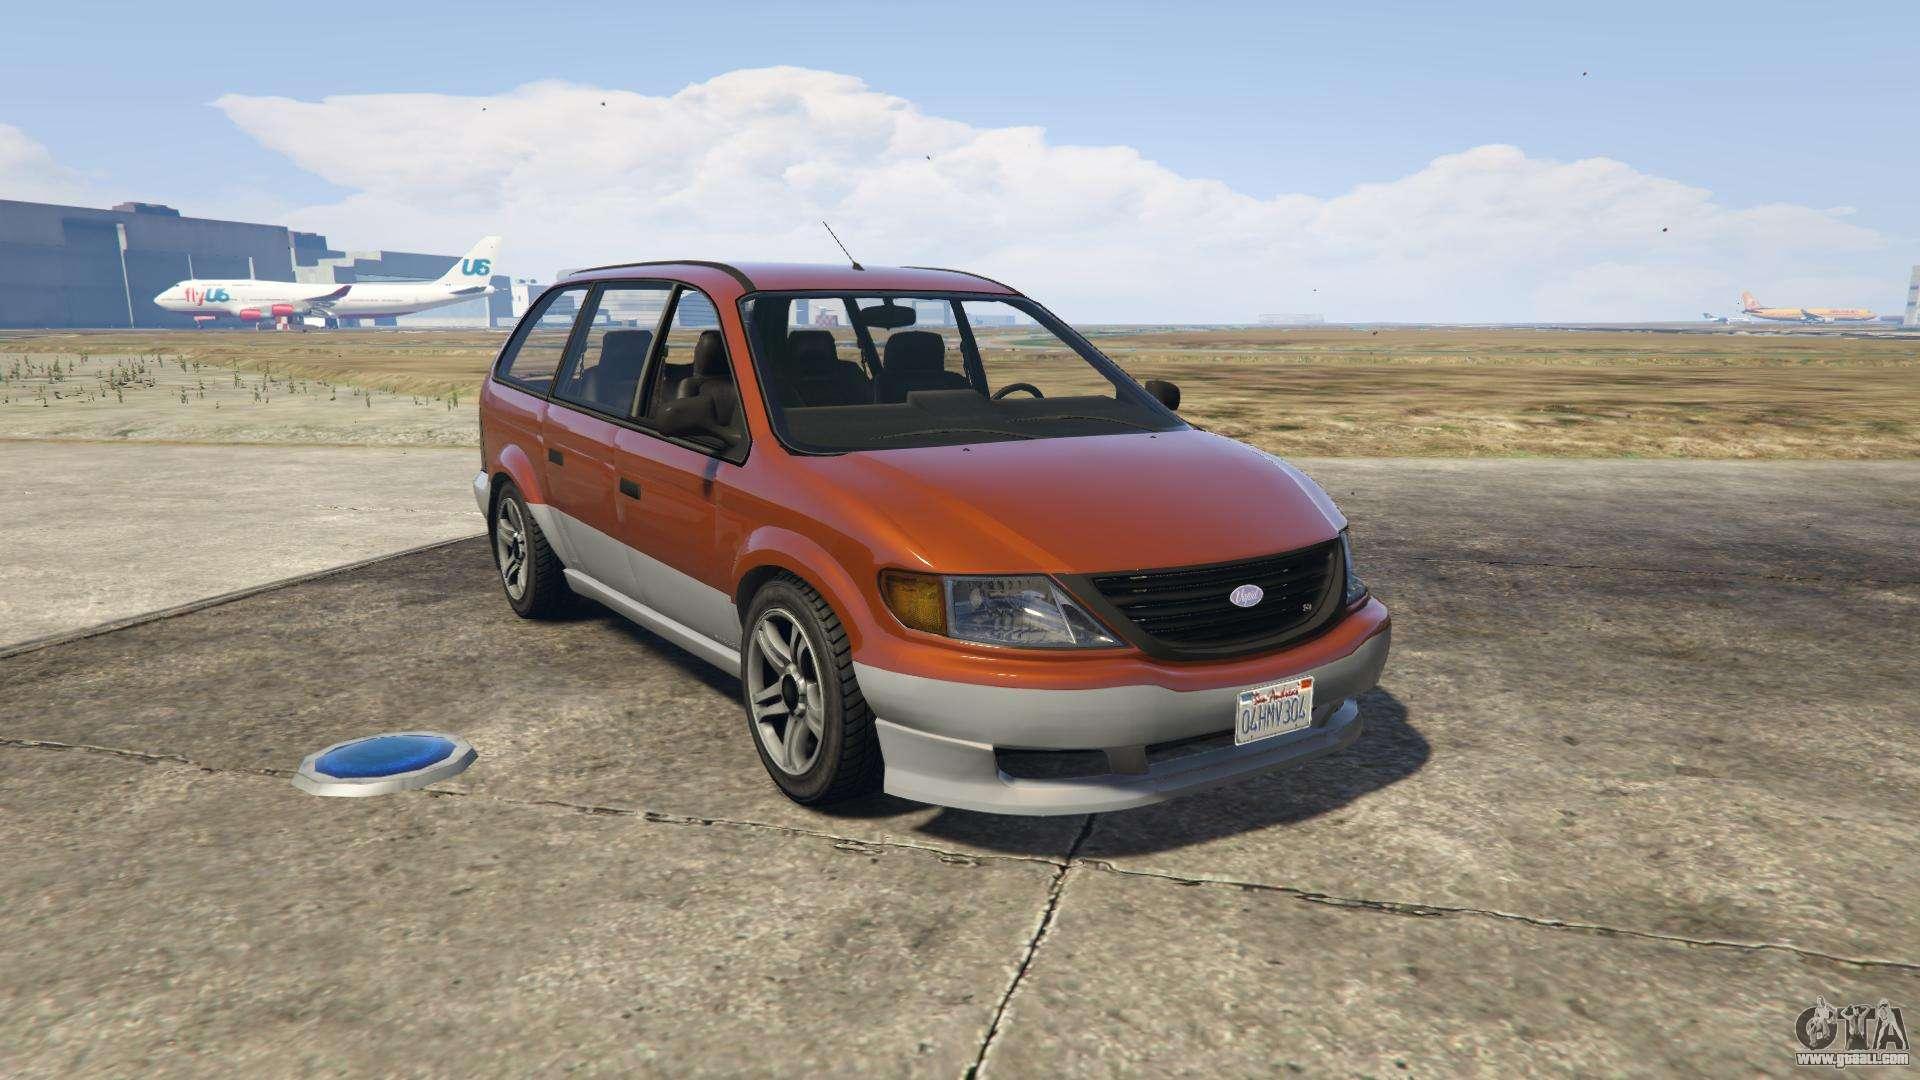 Vapid Minivan From Gta 5 Screenshots Description And